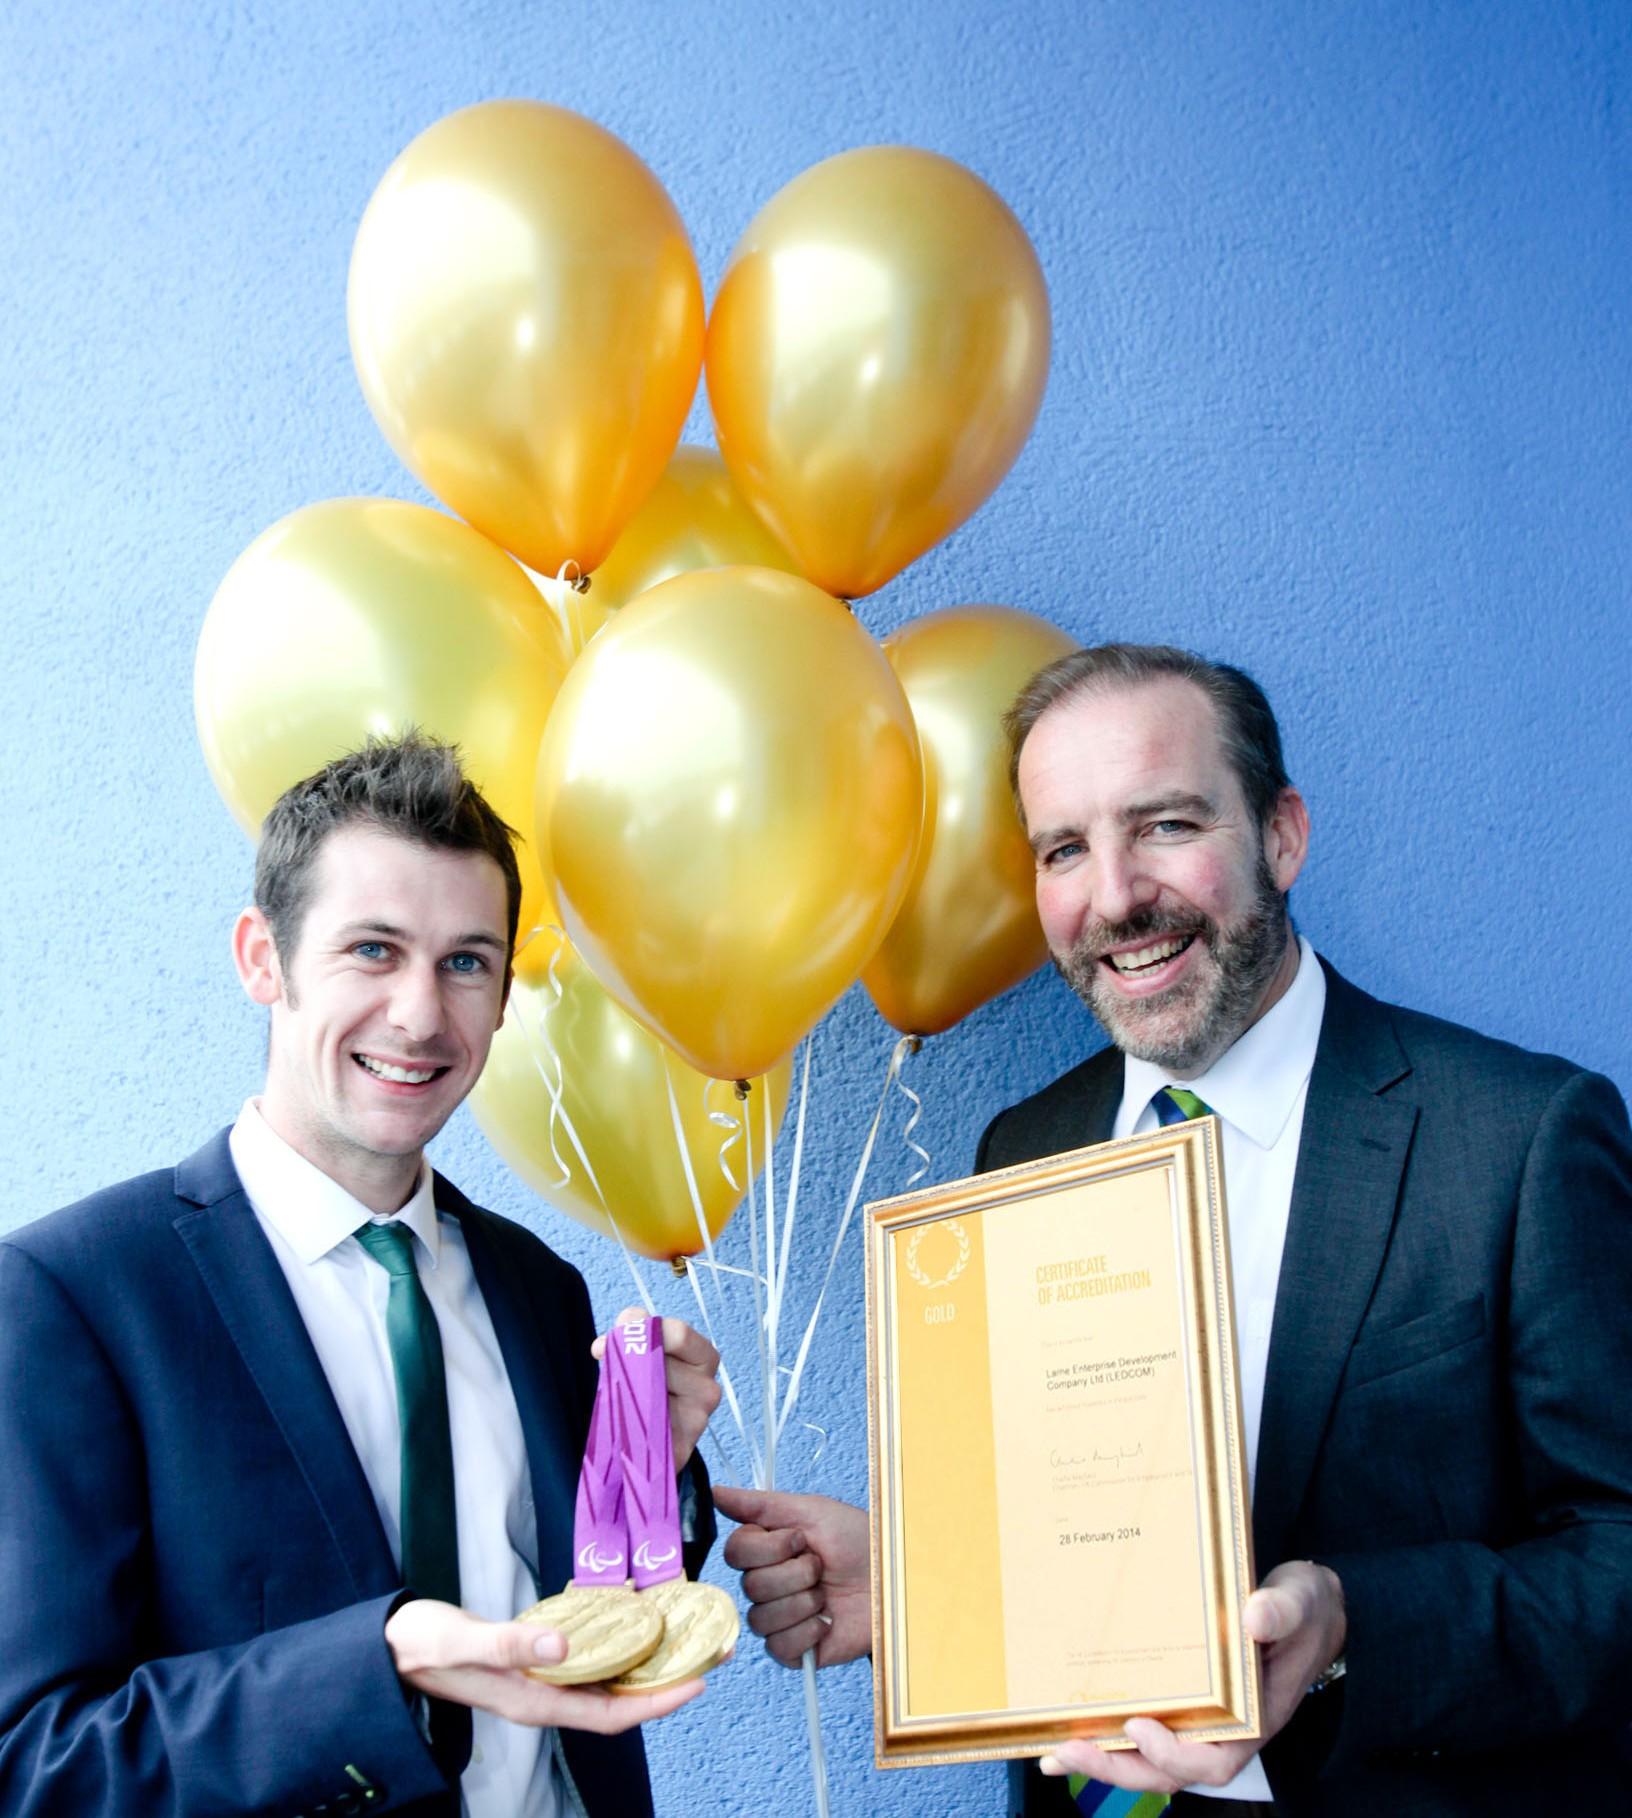 LEDCOM celebrates reaching the Gold Standard